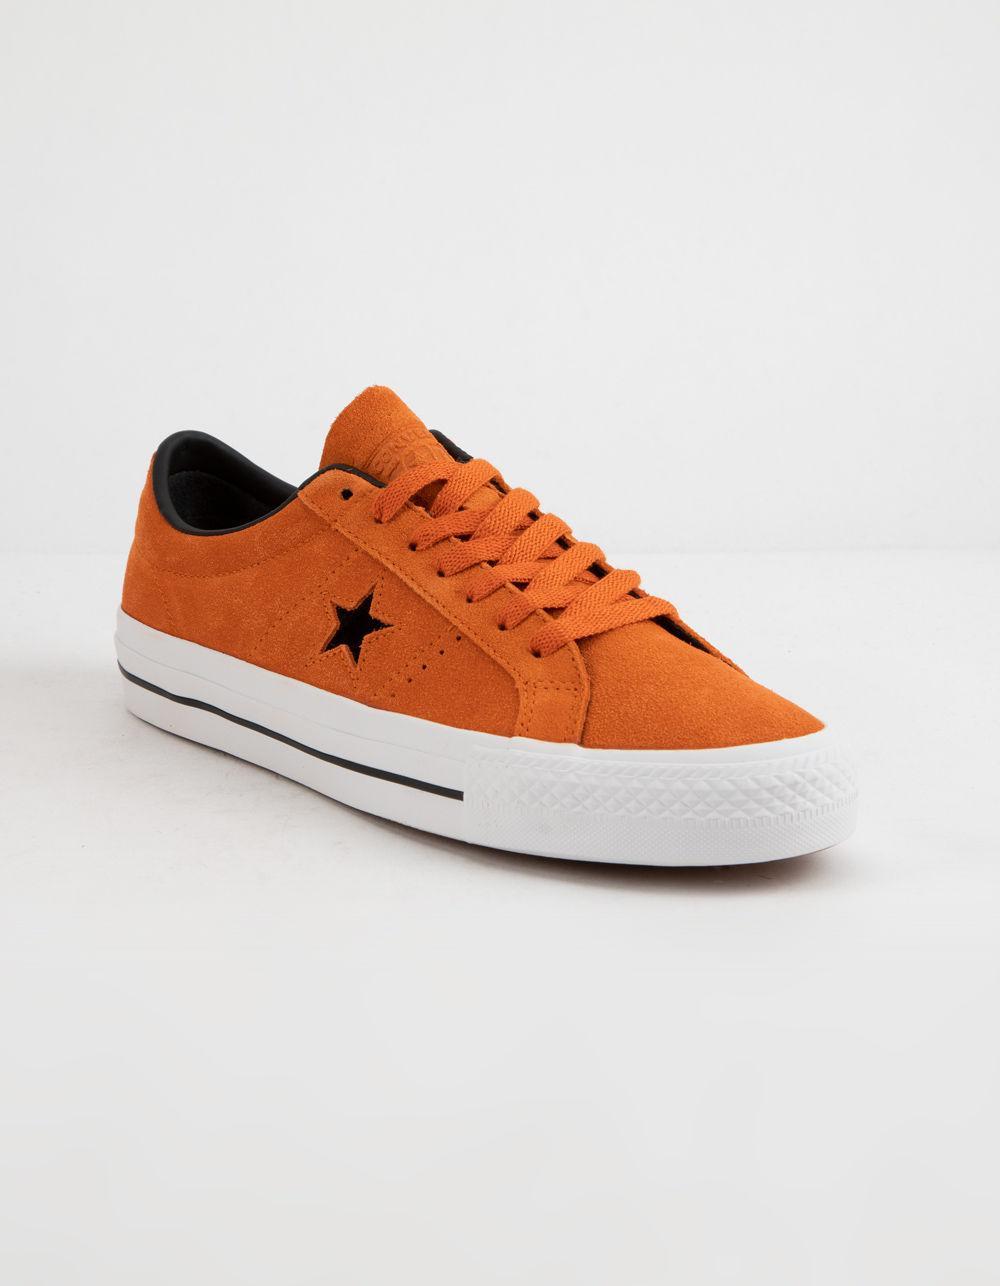 Lyst - Converse One Star Pro Ox Campfire Orange Shoes in Orange for Men 17e56f4a5